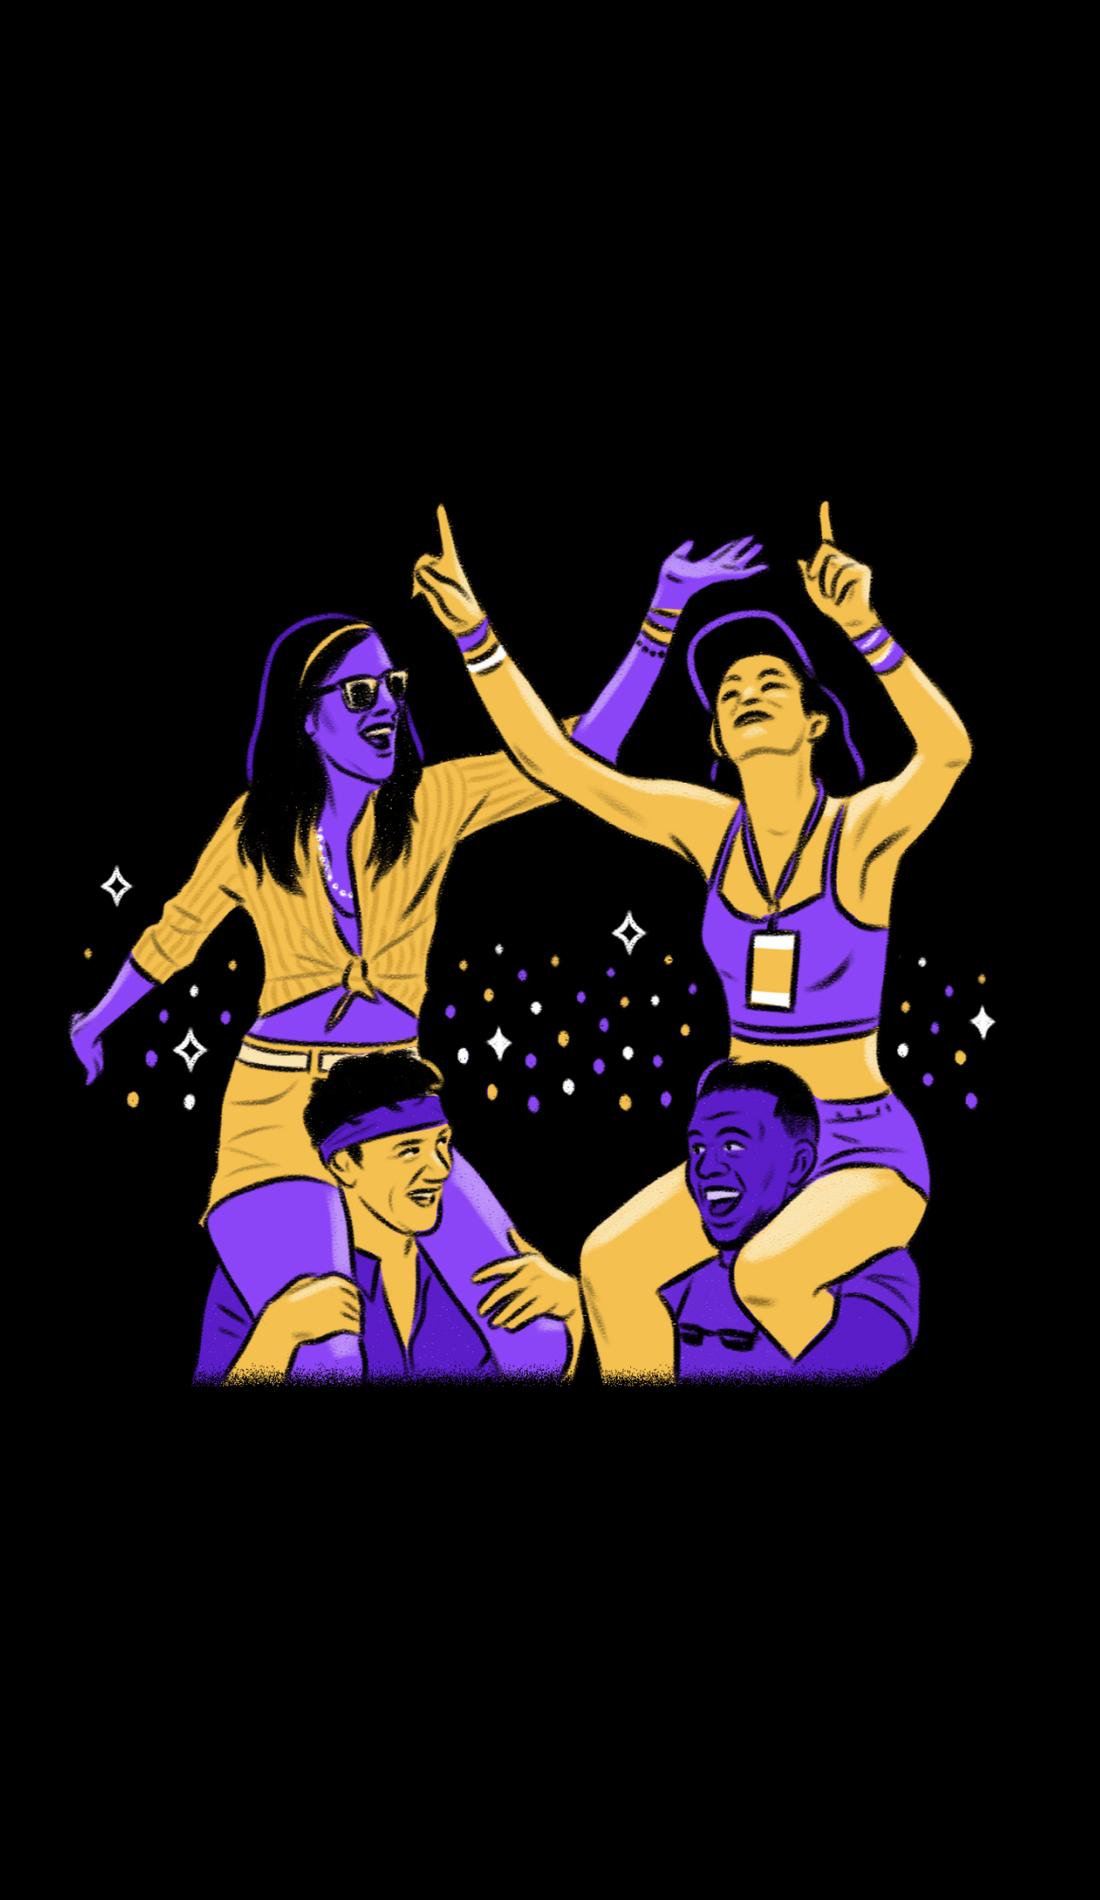 A The Grove Music Festival live event